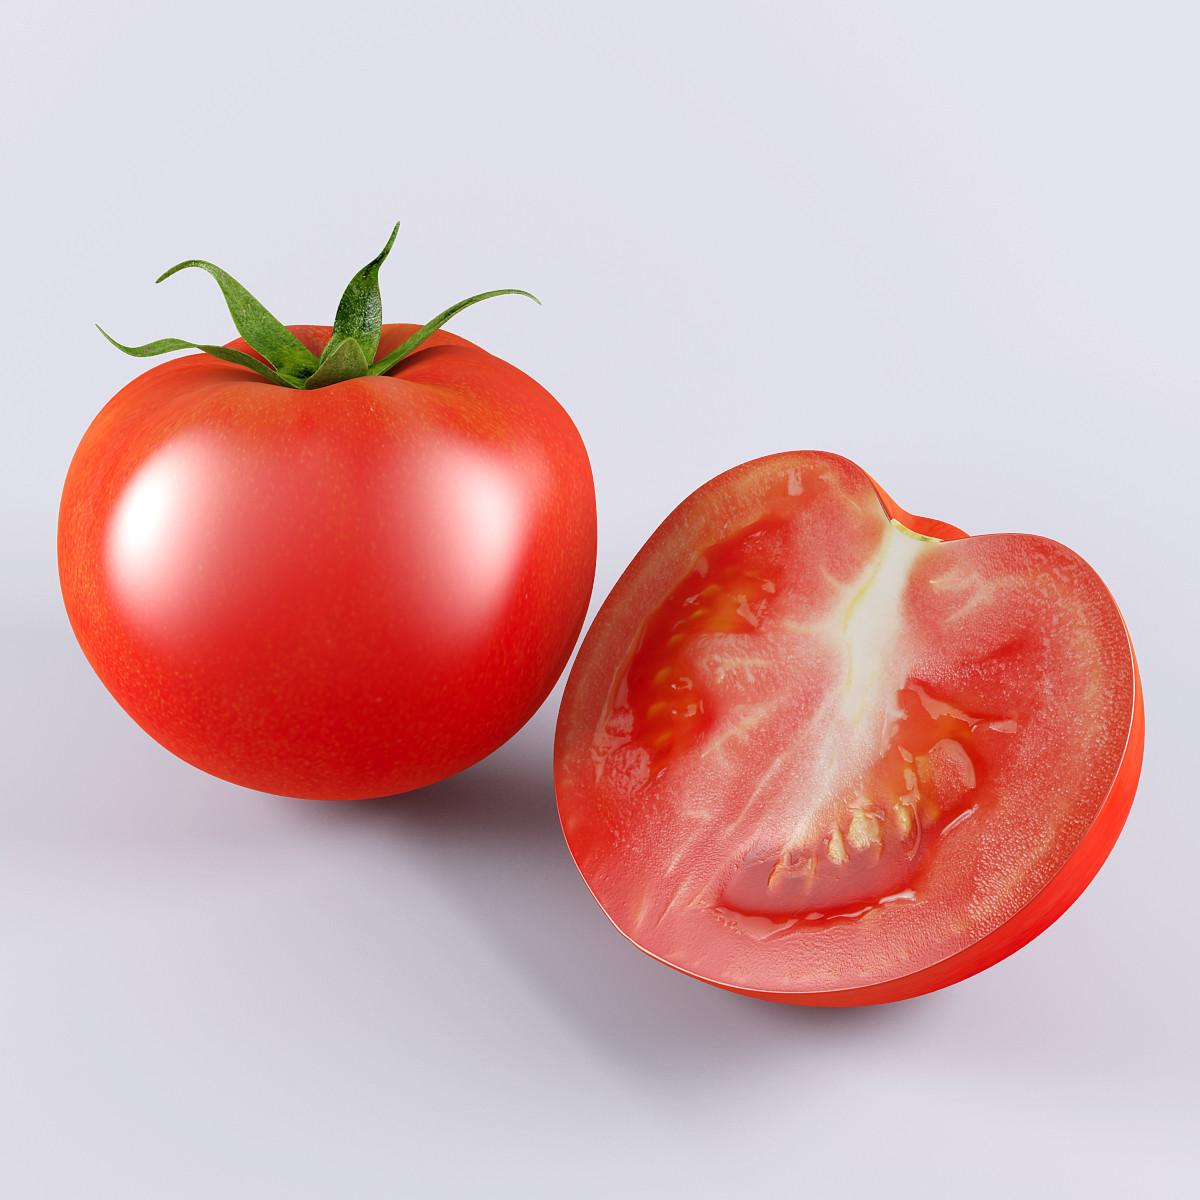 tomato1_1_1_2.jpg